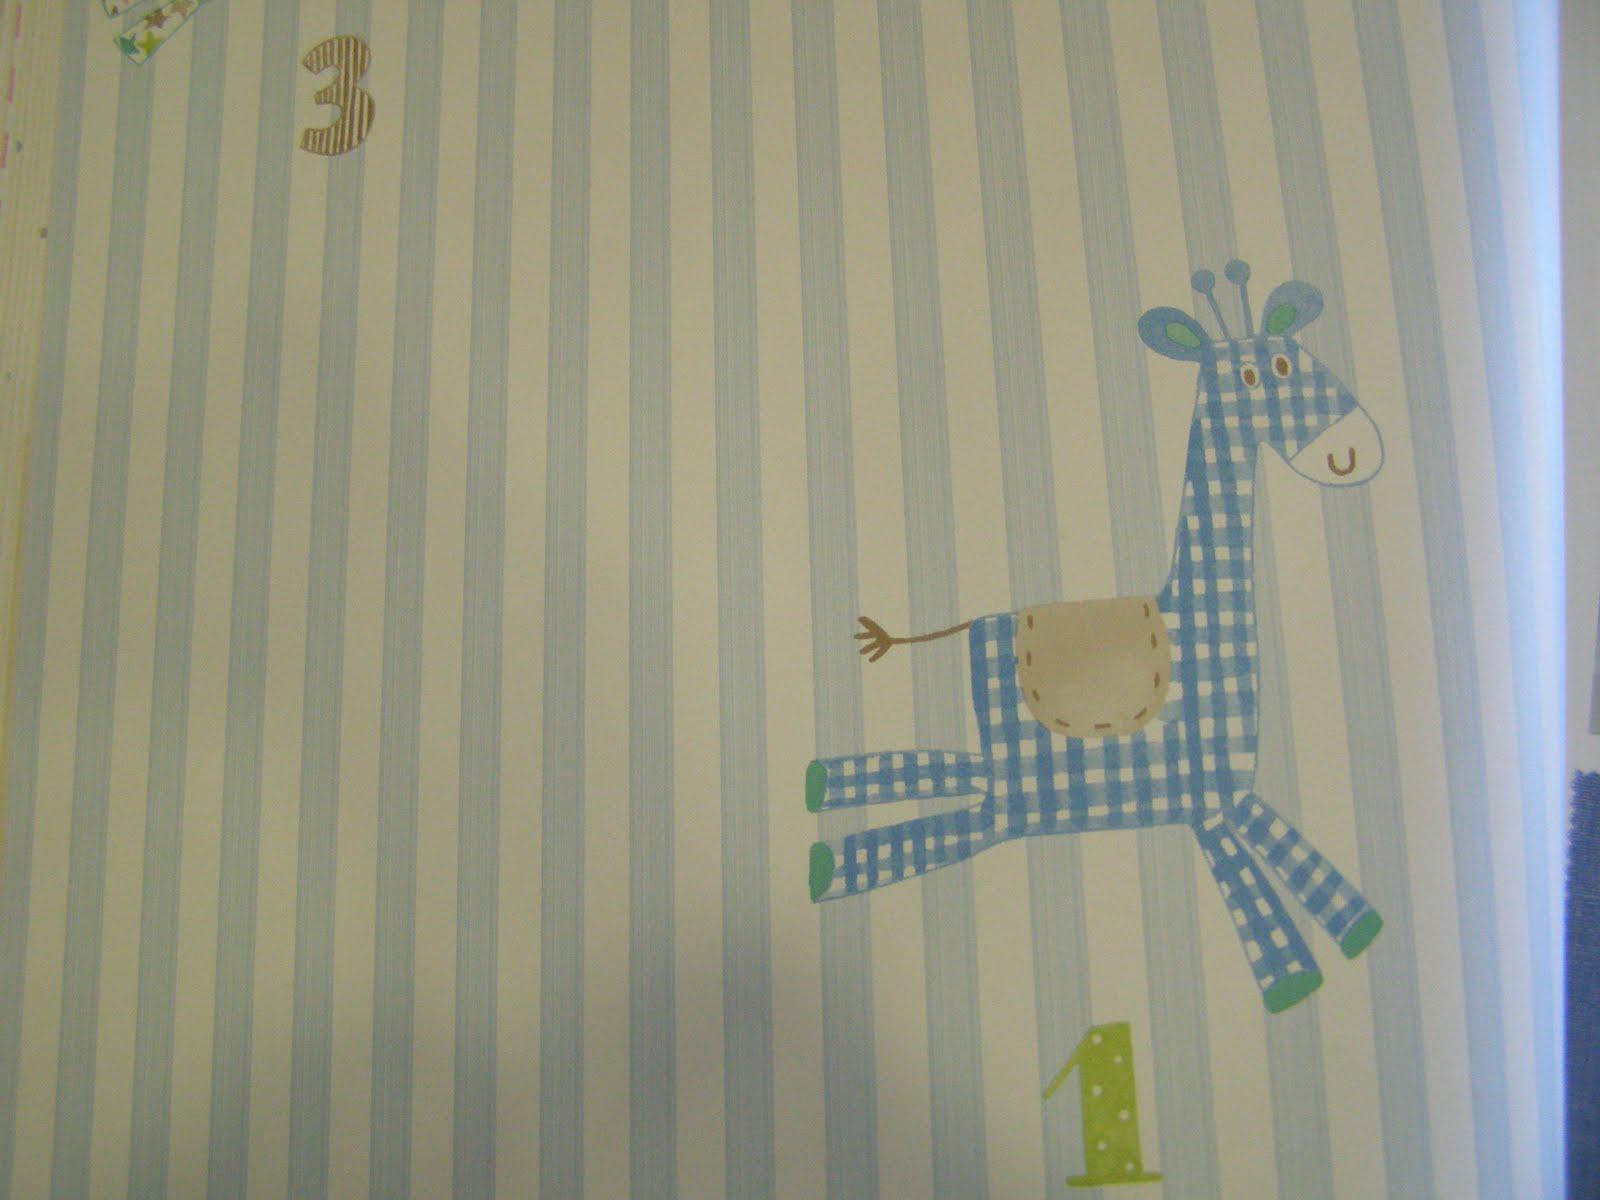 El rinc n de ebano textil 2011 06 05 for Vendo papel pintado